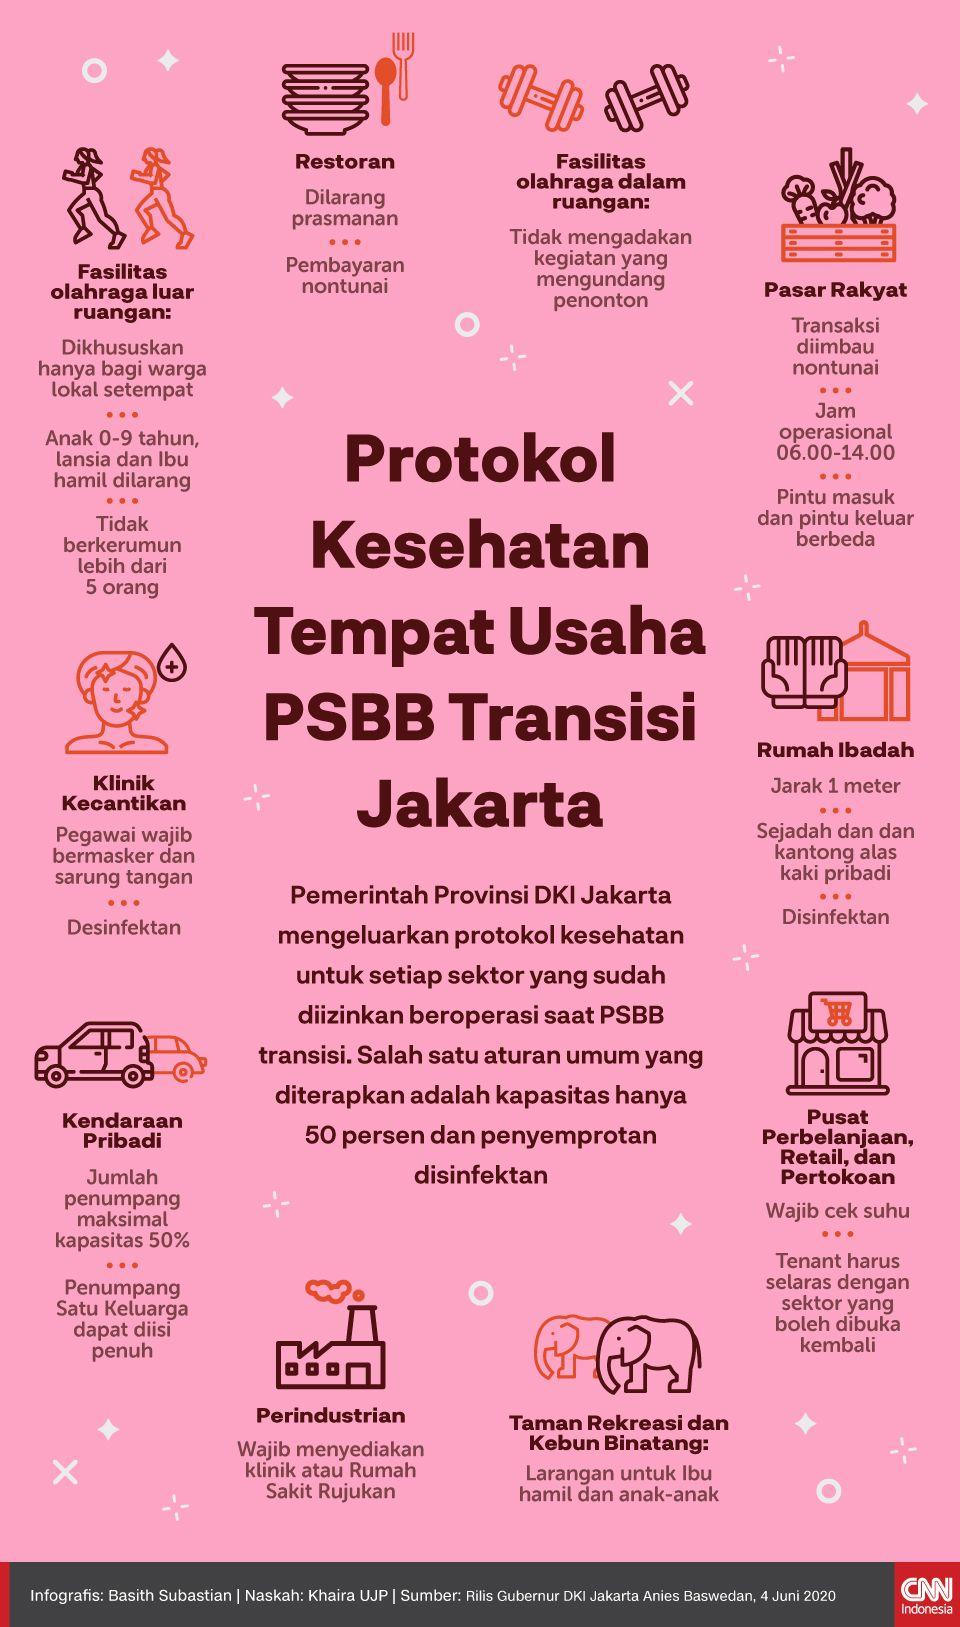 Infografis Protokol Kesehatan Tempat Usaha PSBB Transisi Jakarta